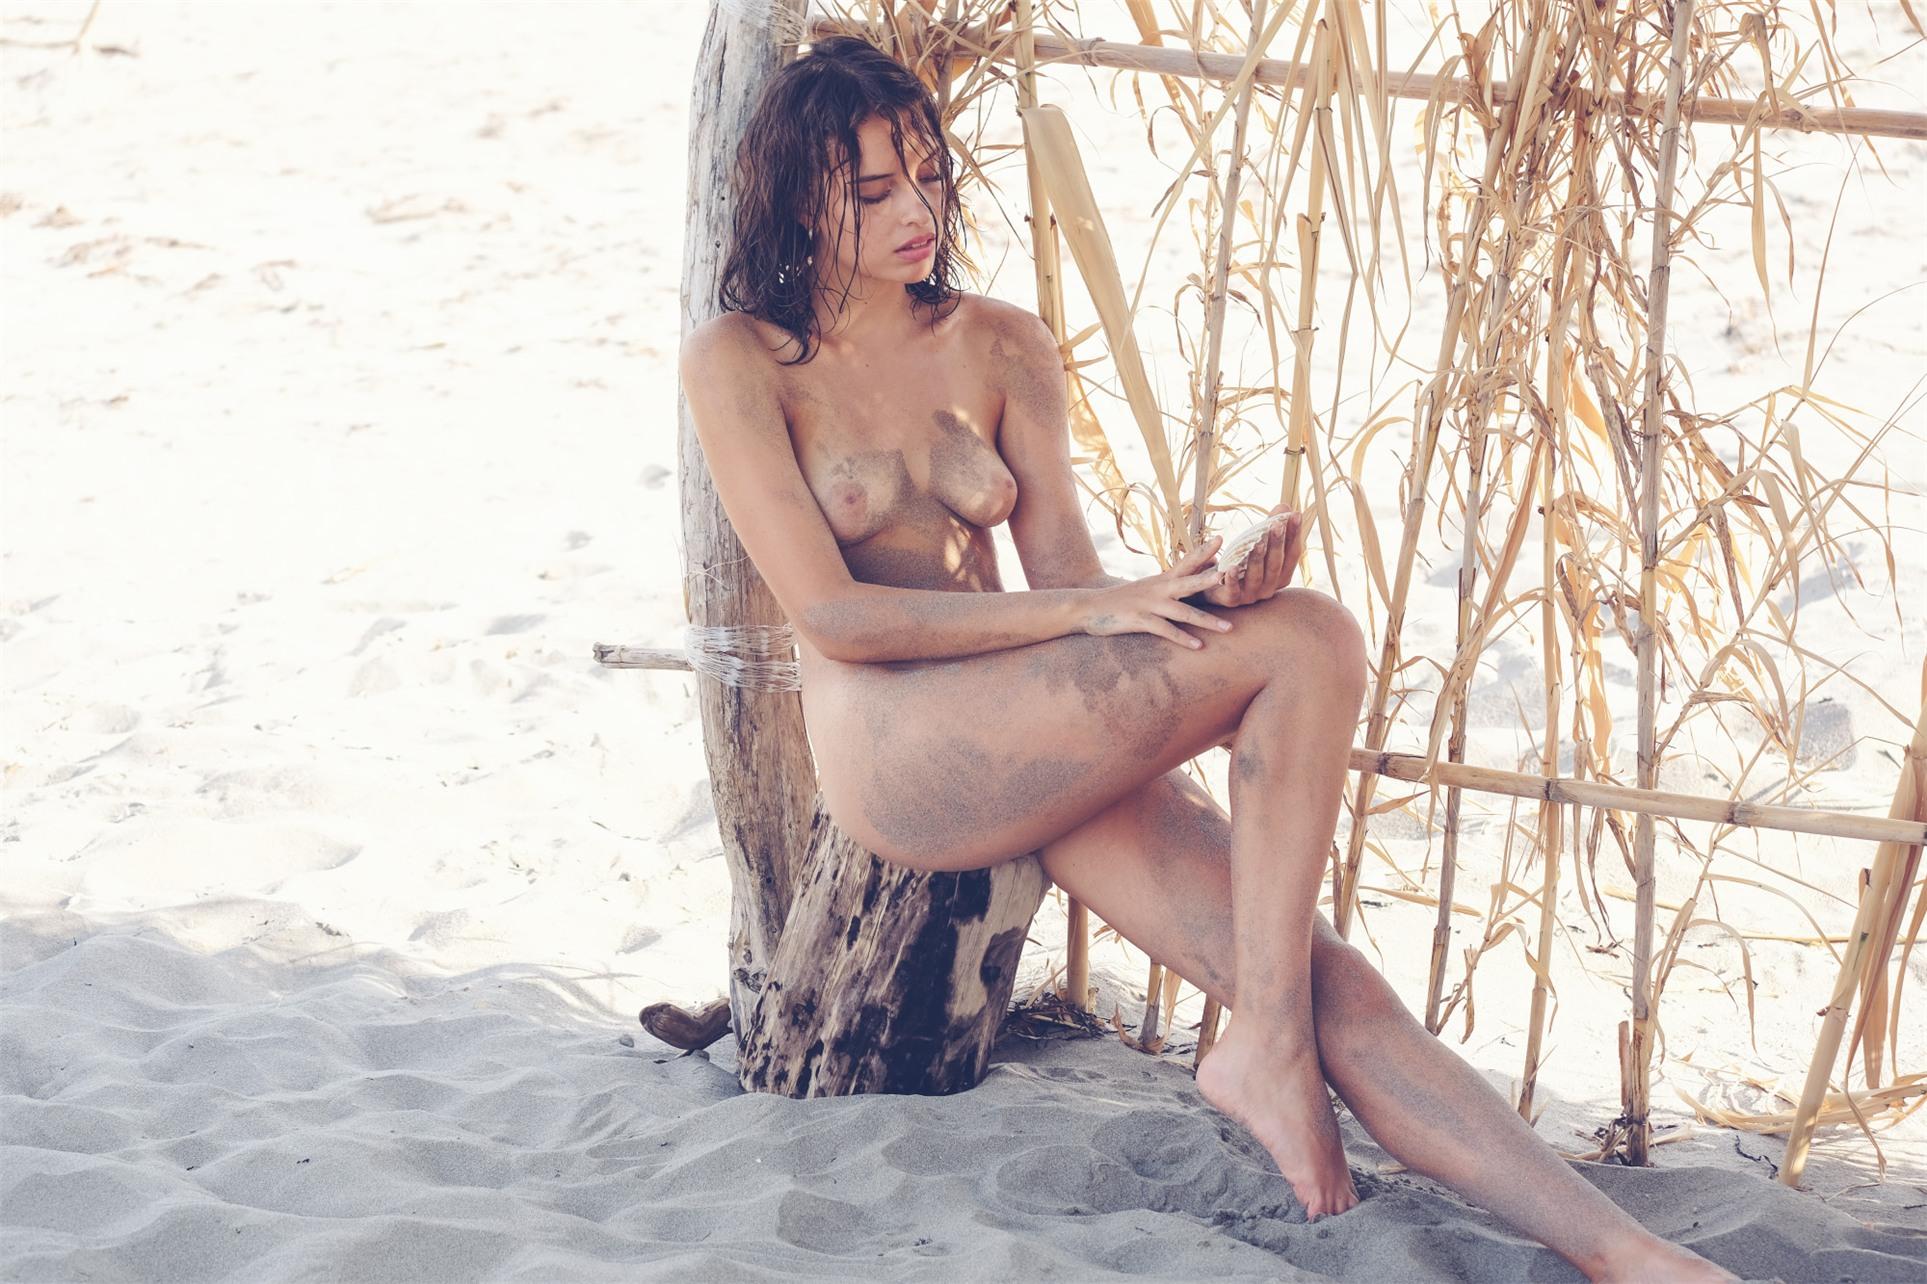 Private Beach / Gloria Fregonese by Adolfo Valente / Riven Magazine